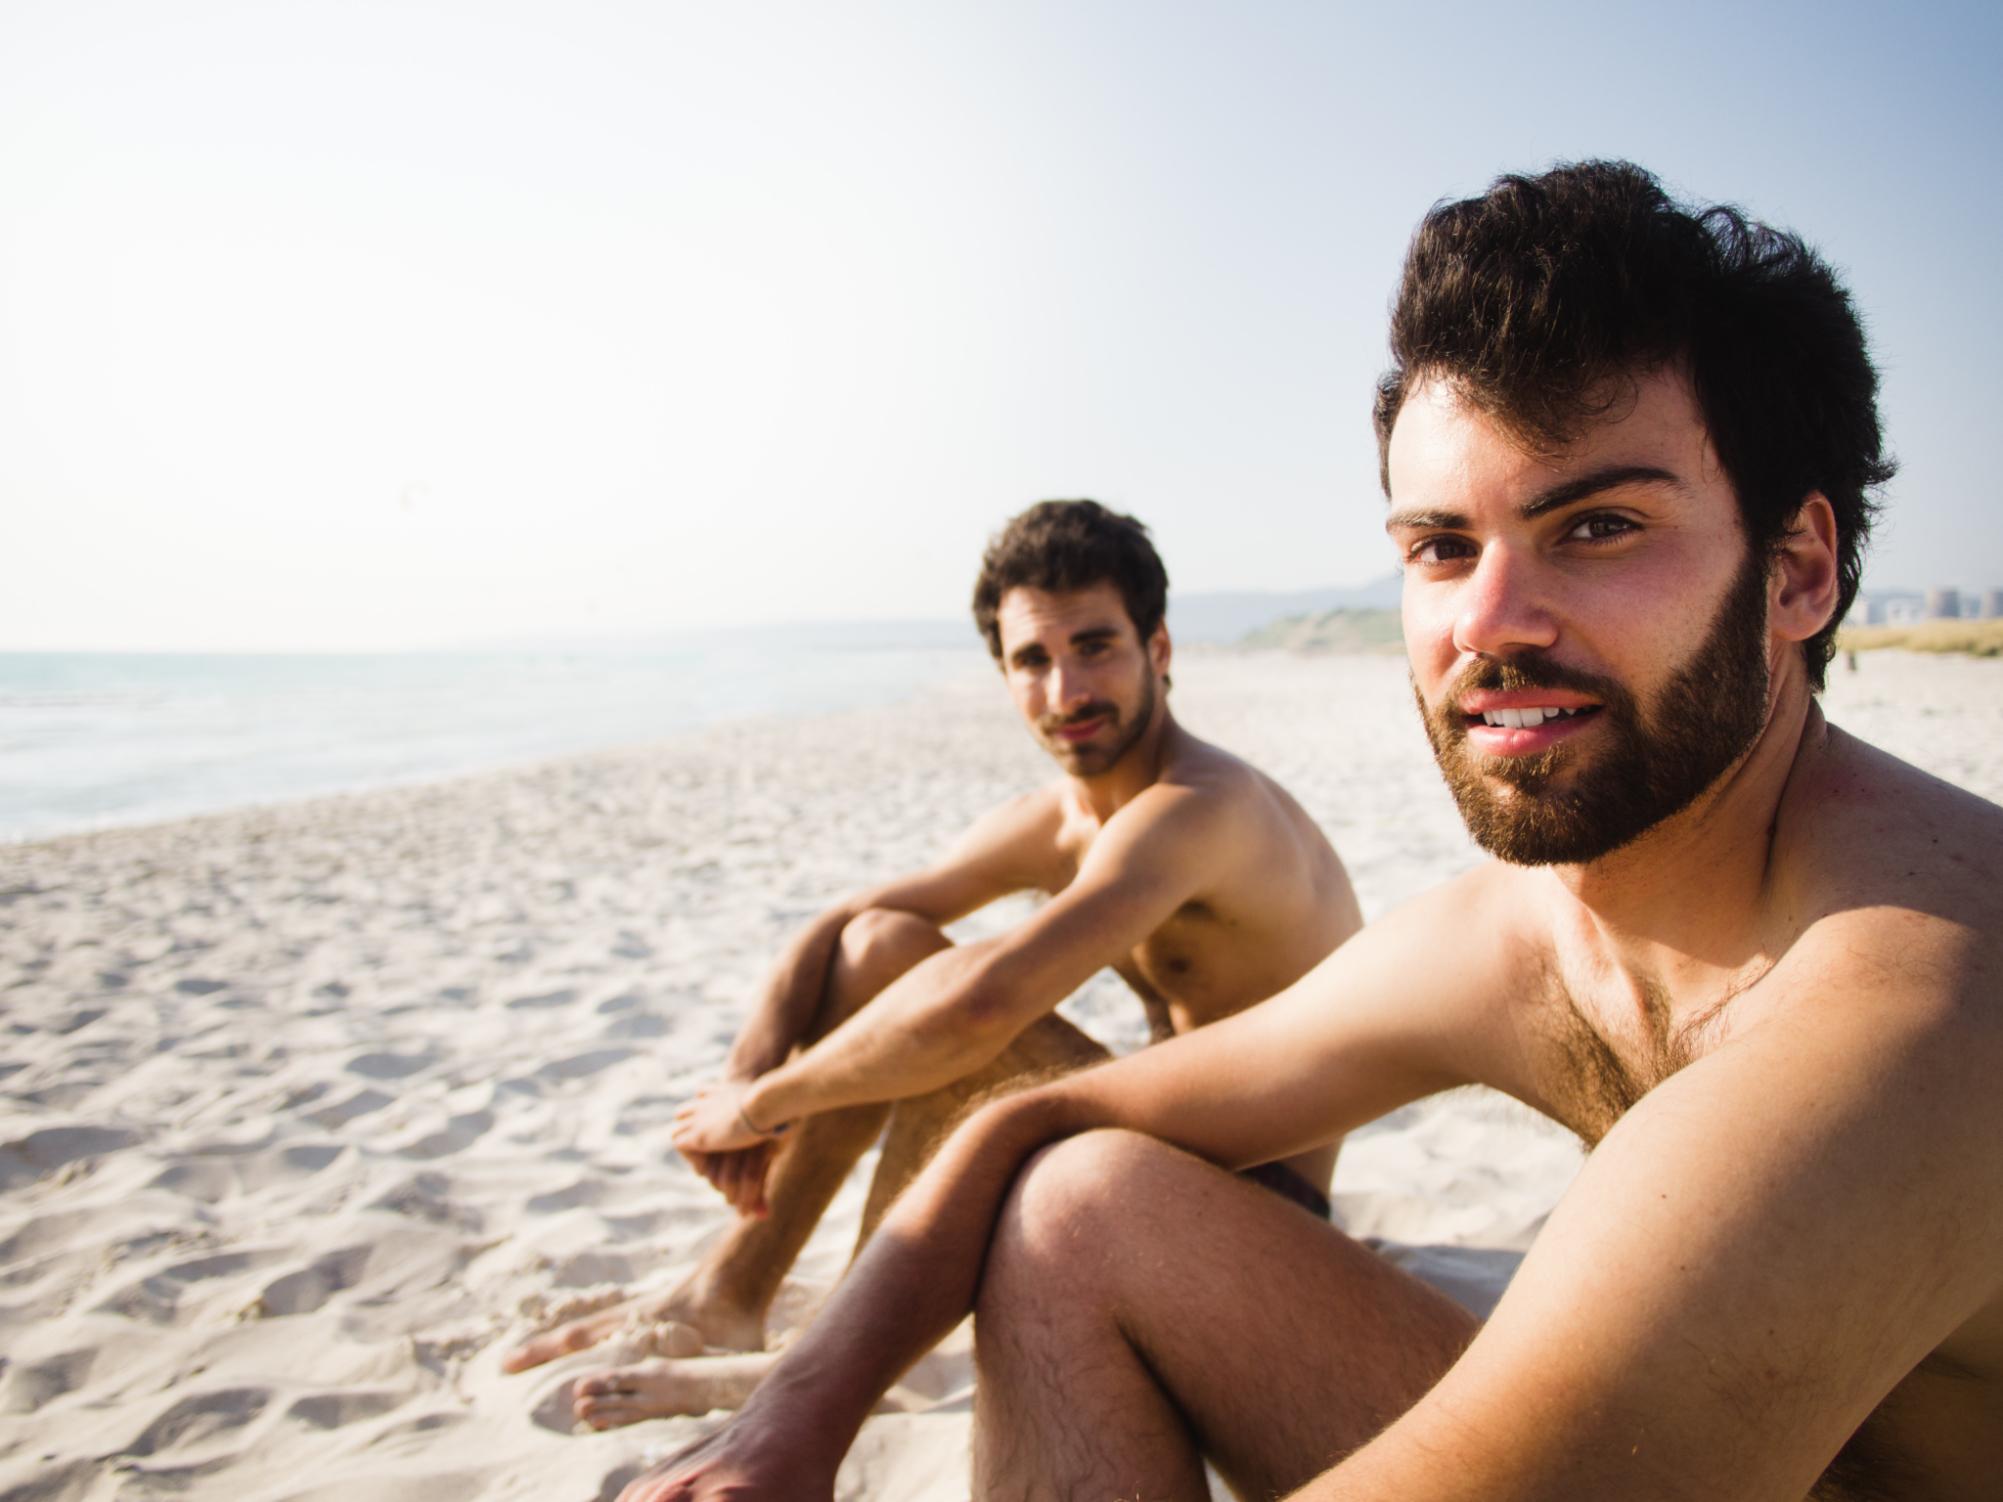 Charm of Italian men is lust in translation - Telegraph